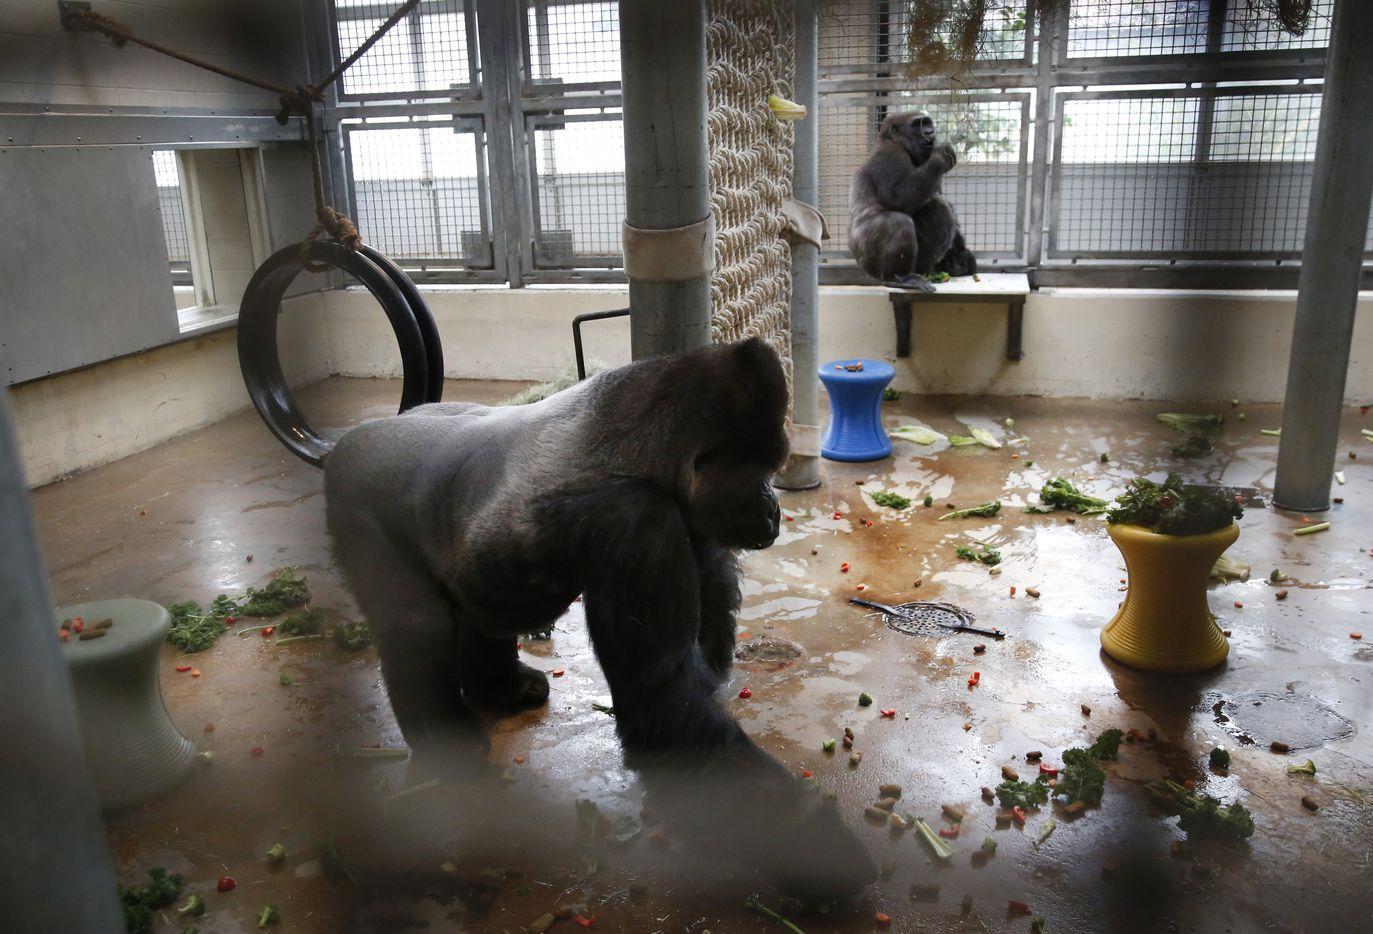 Subira, a silverback gorilla, walks across the heated behind-the-scenes gorilla building at the Dallas Zoo.